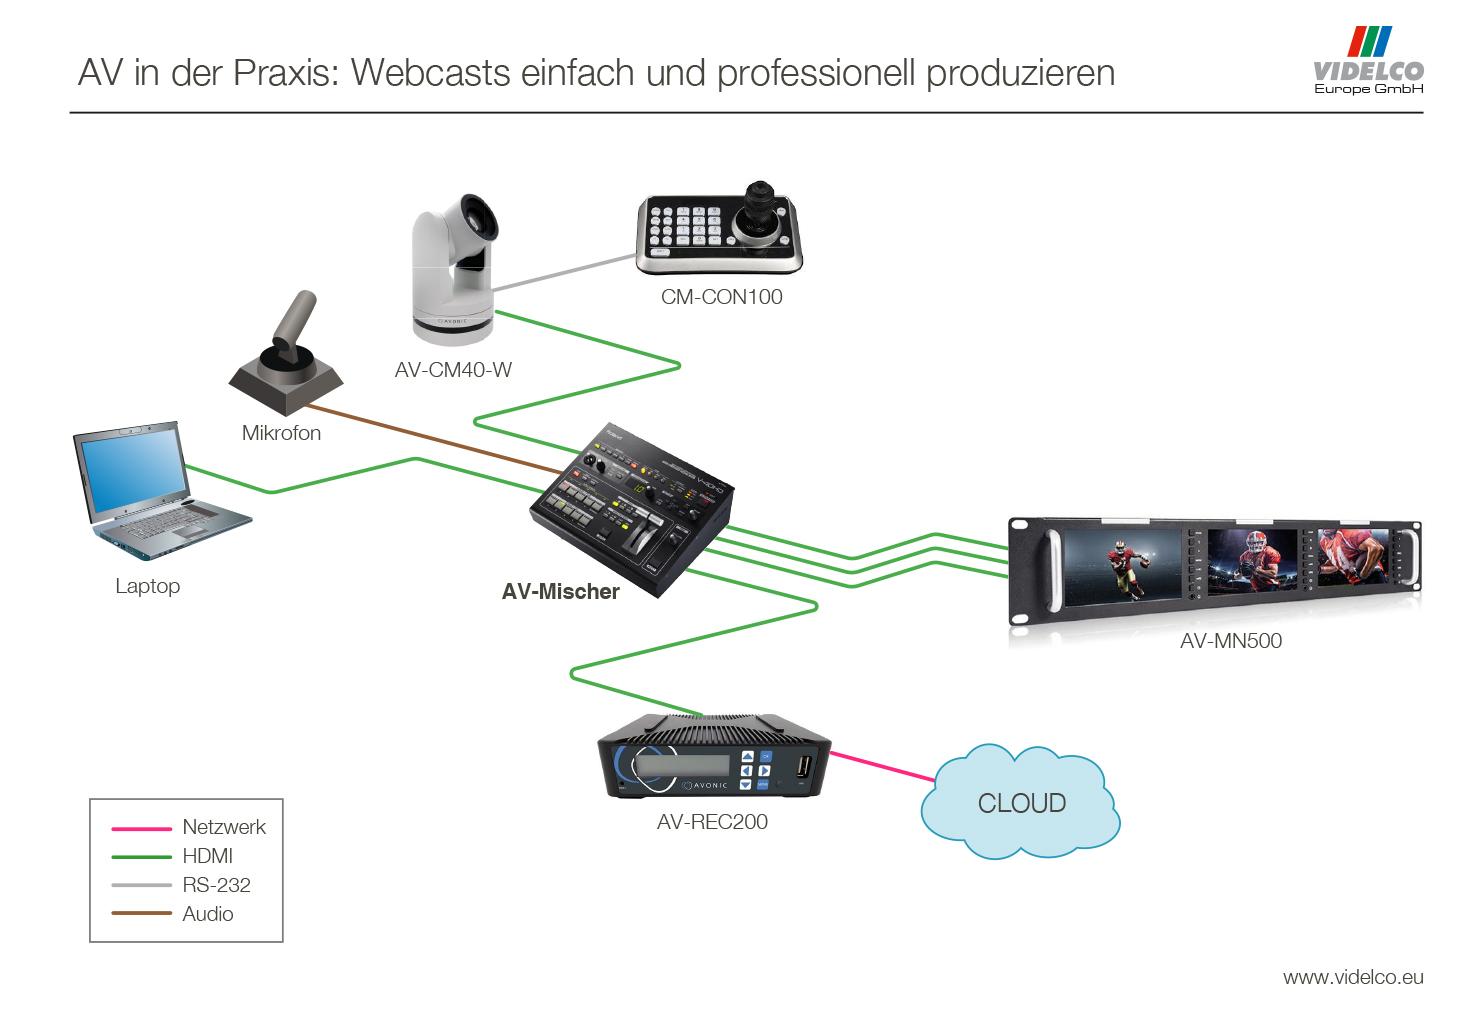 Setup-Beispiel: Webcast